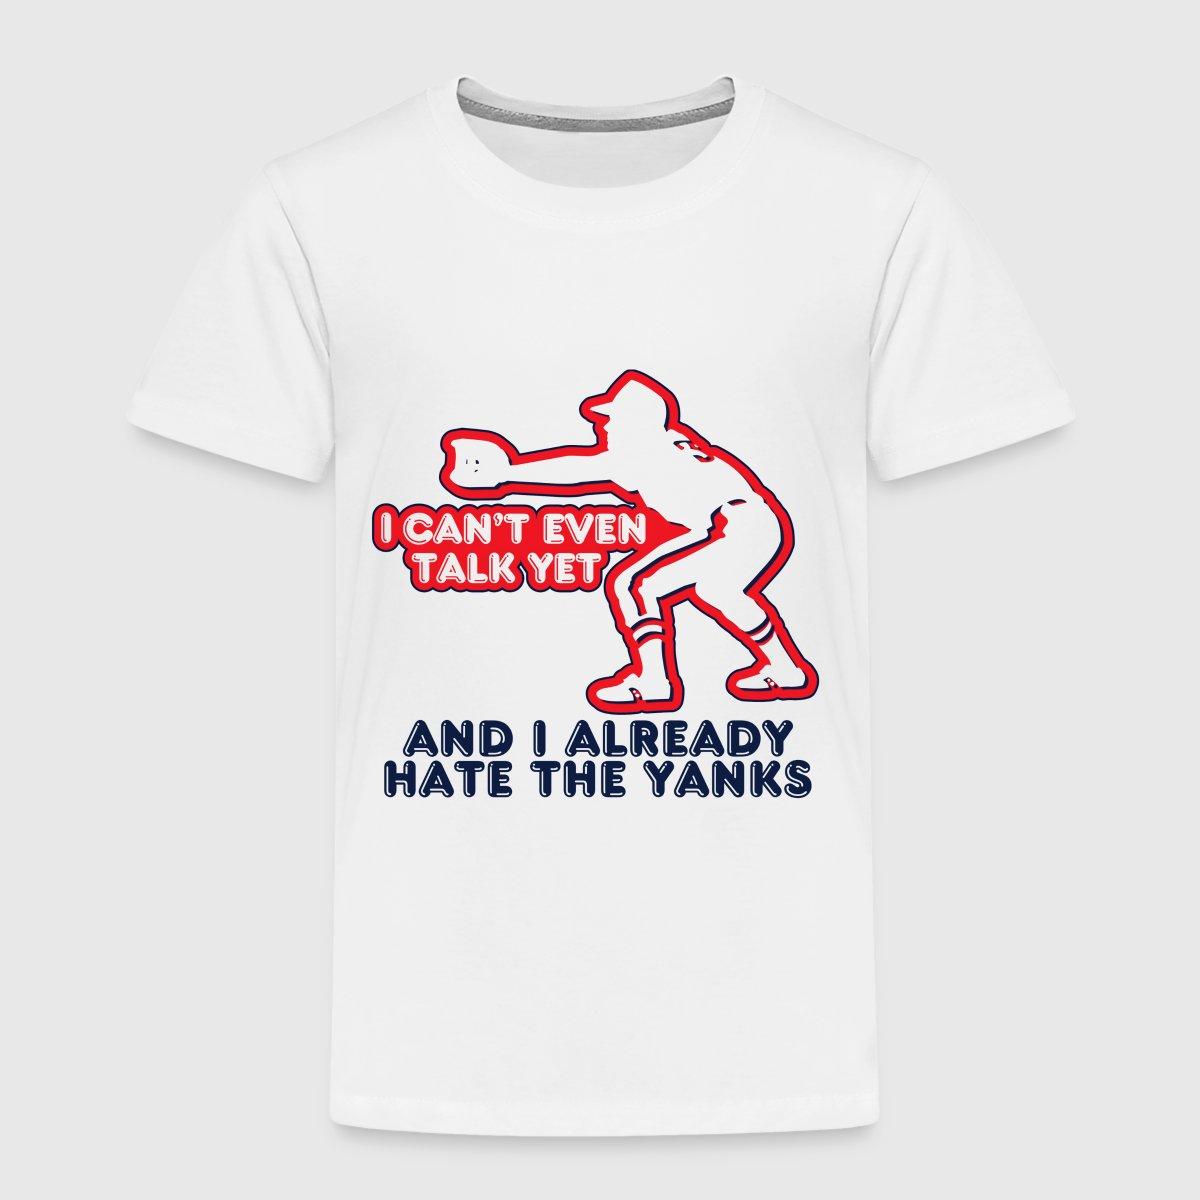 detailed look 82696 3b50e New York Yankees Funny T Shirts   RLDM